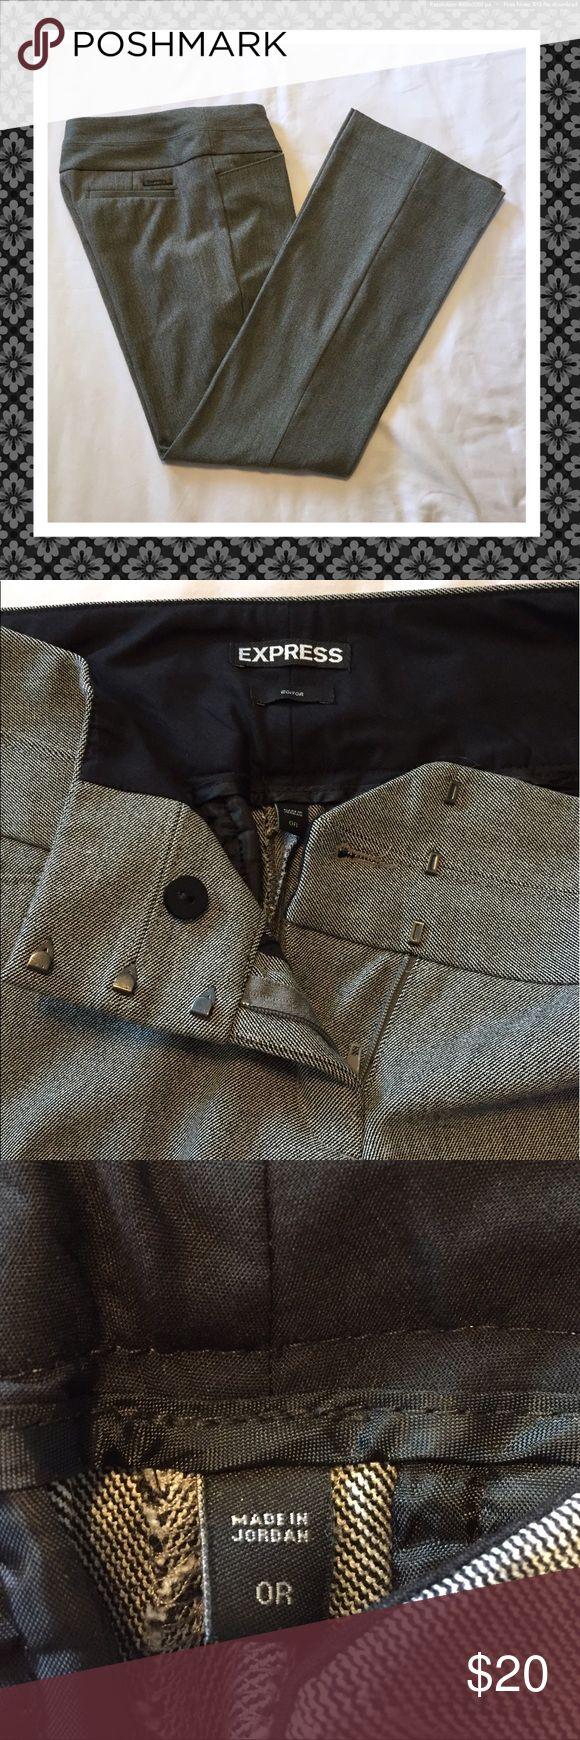 Free online photo editor selective coloring - Express Editor Dress Pants Express Editor Dress Pants Color Gray Size 0r Description